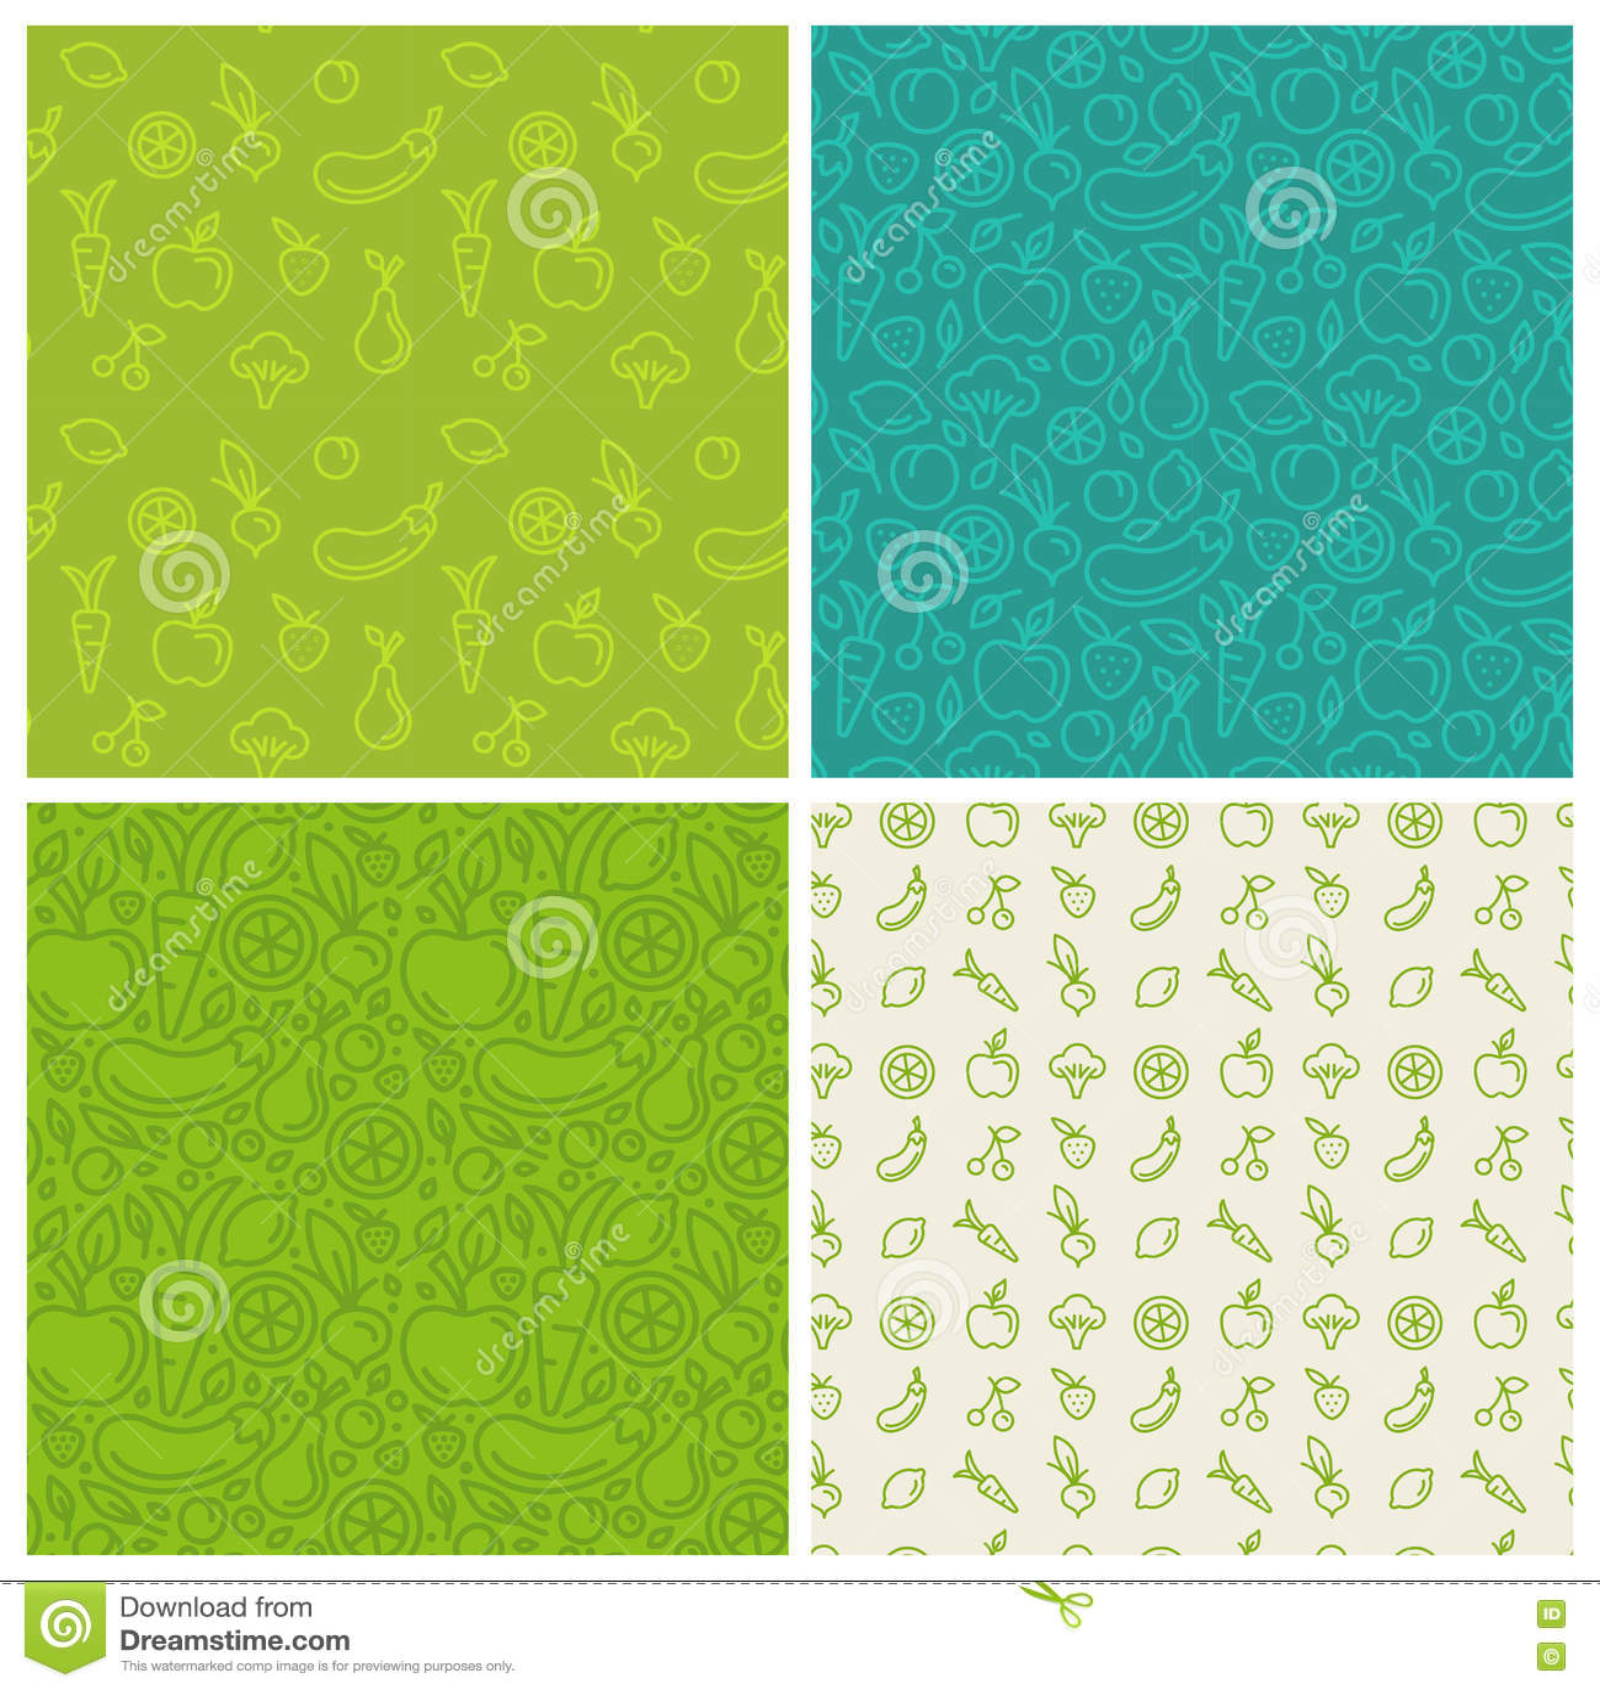 Vector set of green seamless patterns